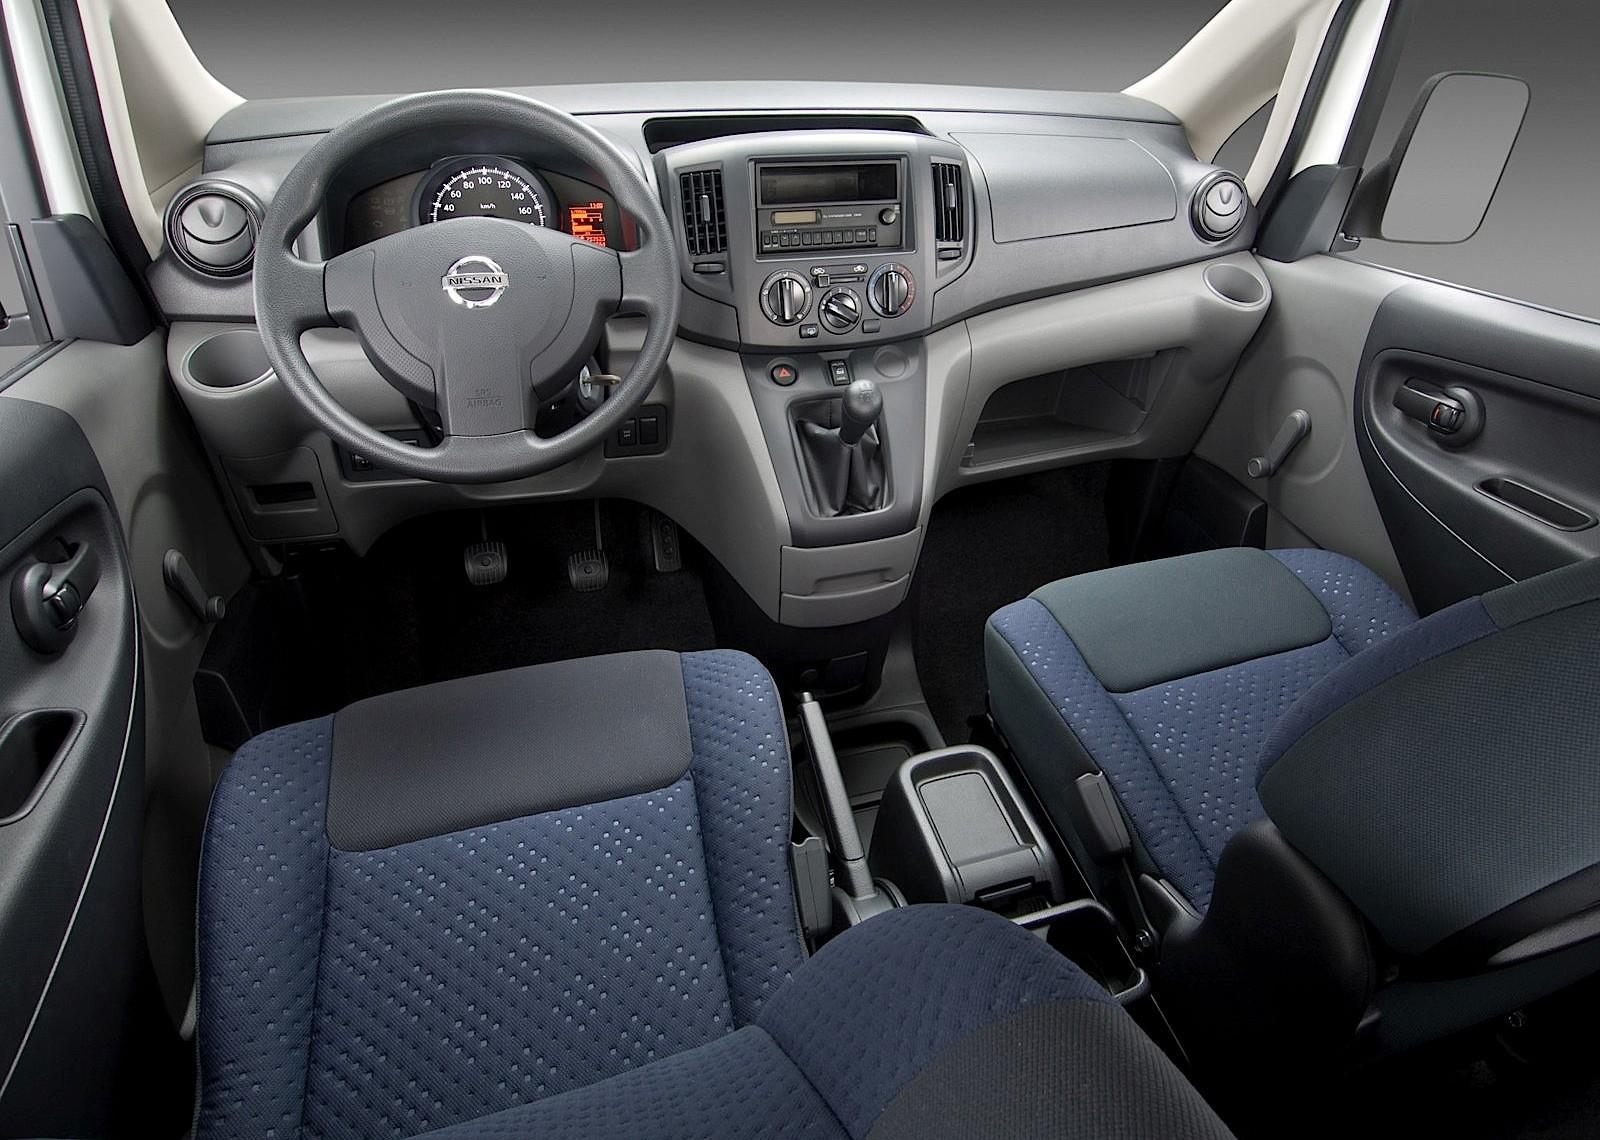 Nissan Nv Passenger >> NISSAN NV200 - 2009, 2010, 2011, 2012, 2013, 2014, 2015, 2016, 2017 - autoevolution